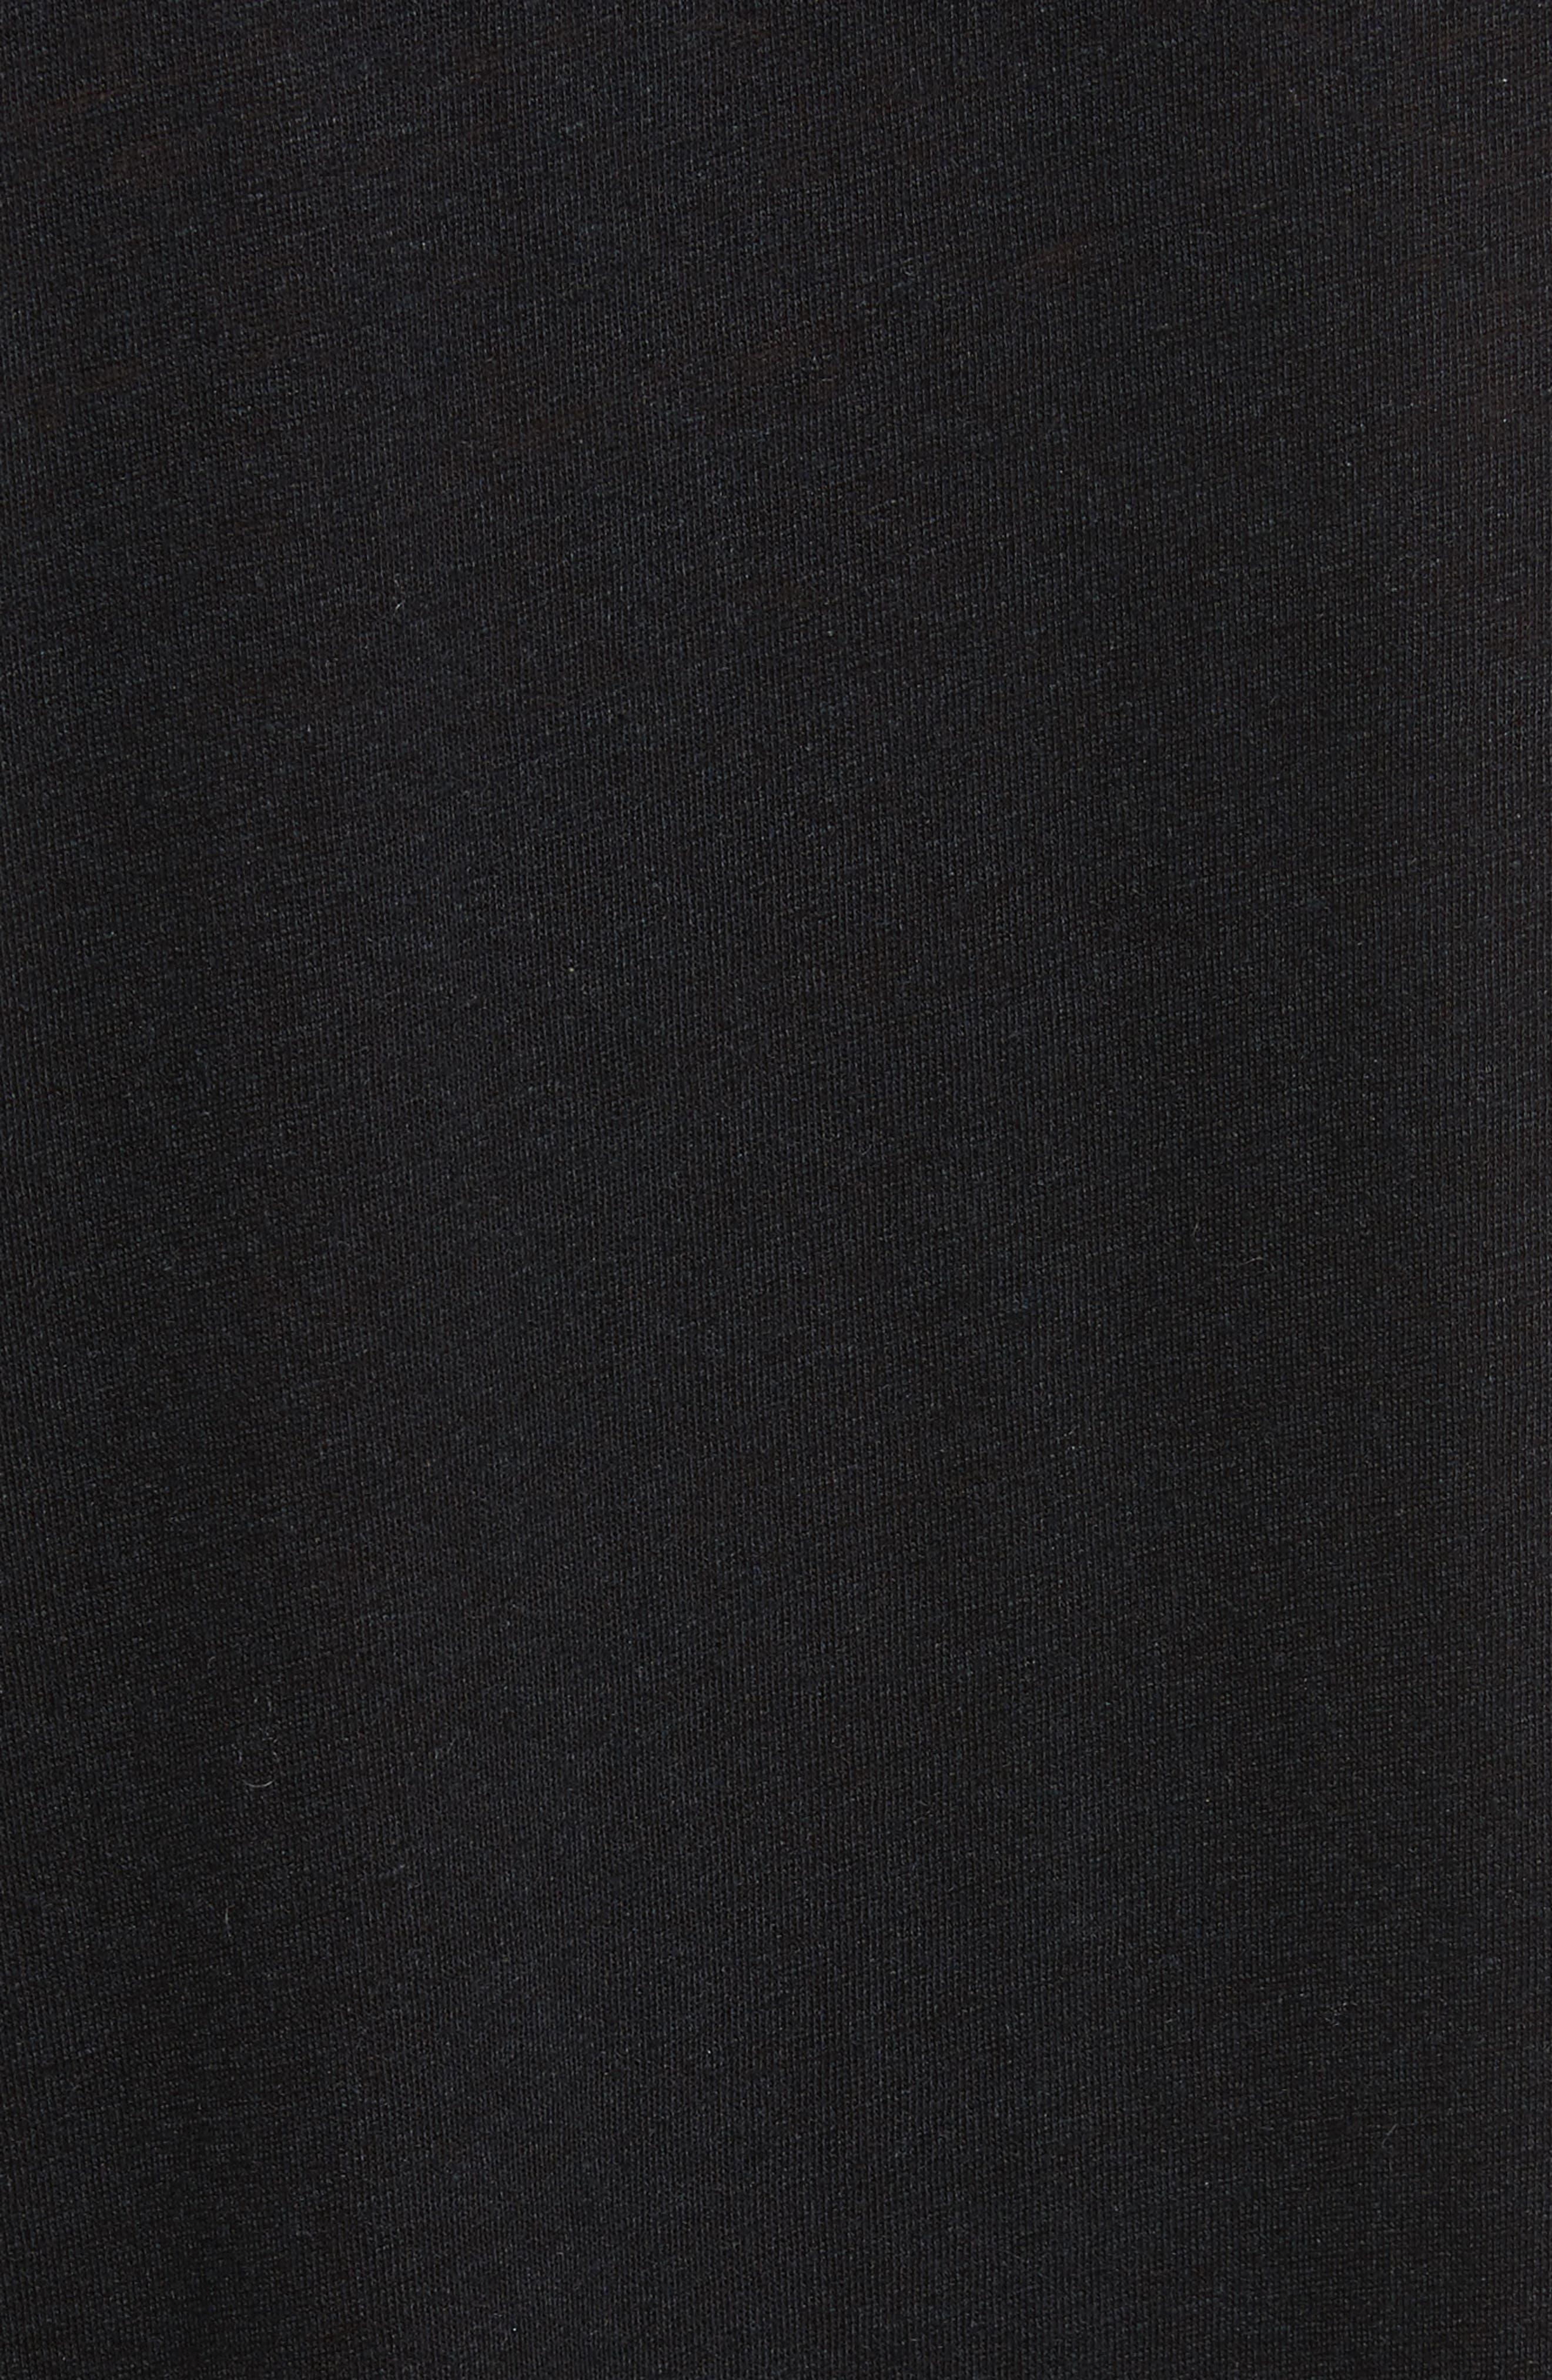 Damani Knit Top,                             Alternate thumbnail 5, color,                             002